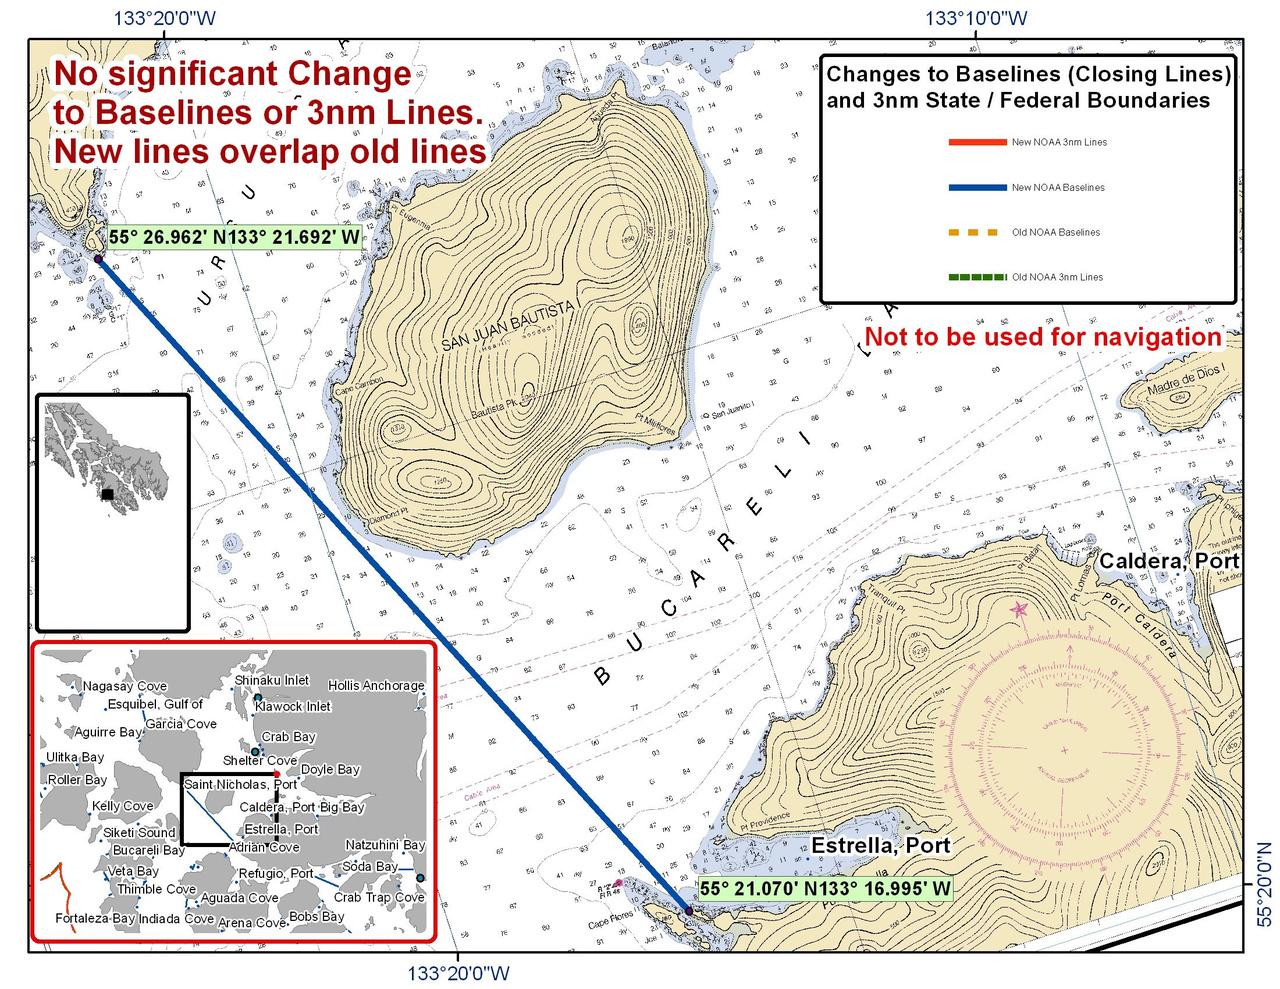 Chart for Bucarelli Bay